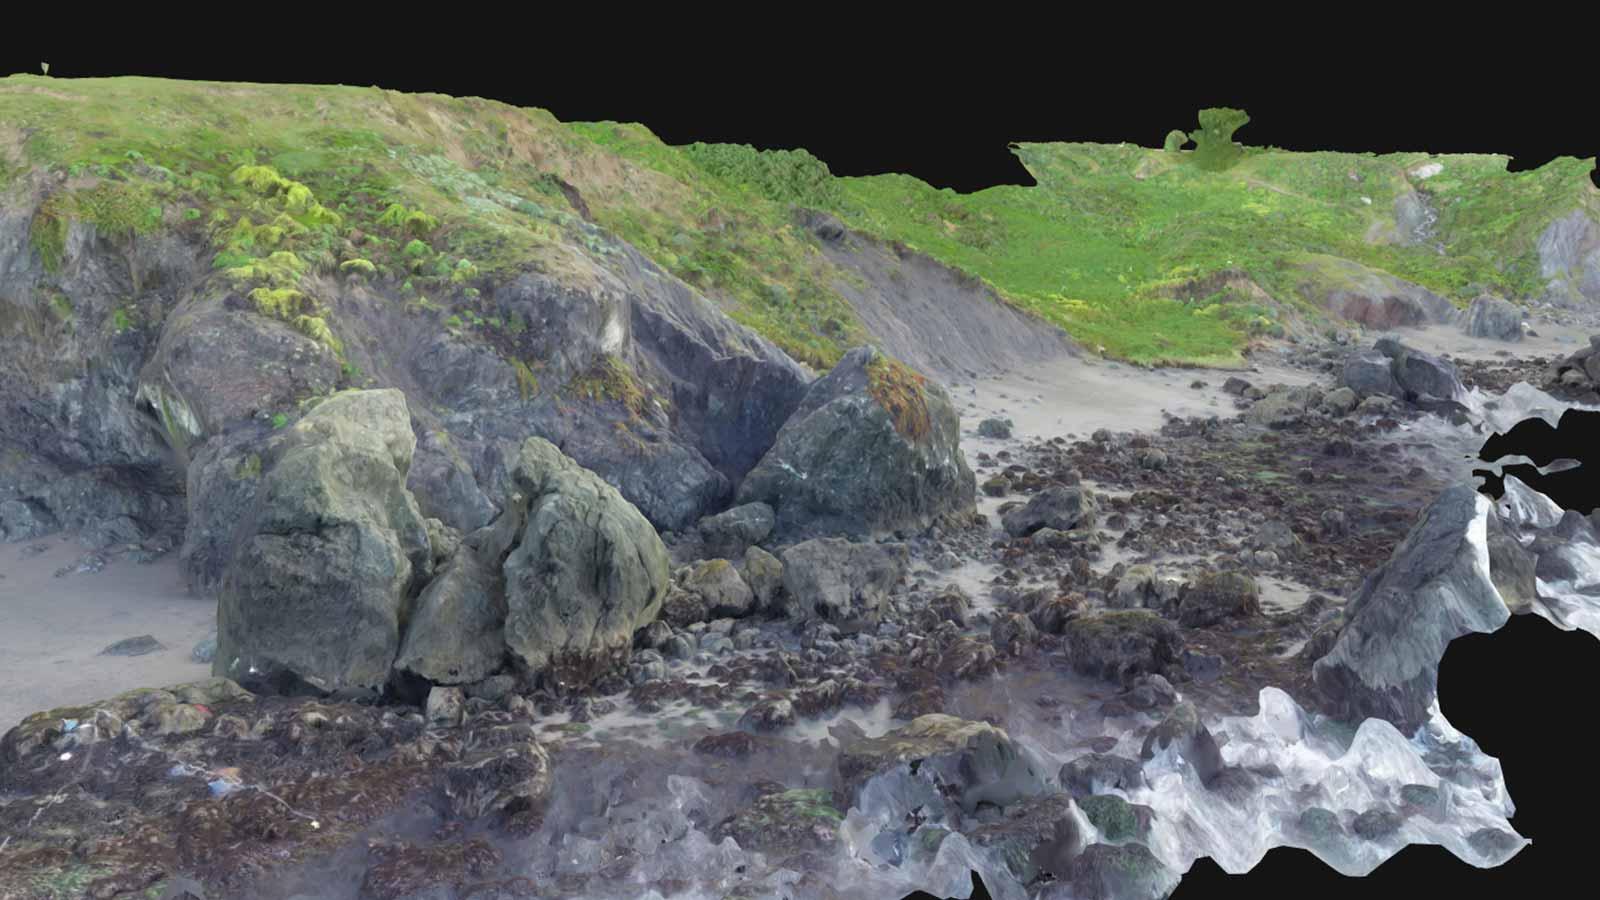 drone-model-of-a-rocky-coastline